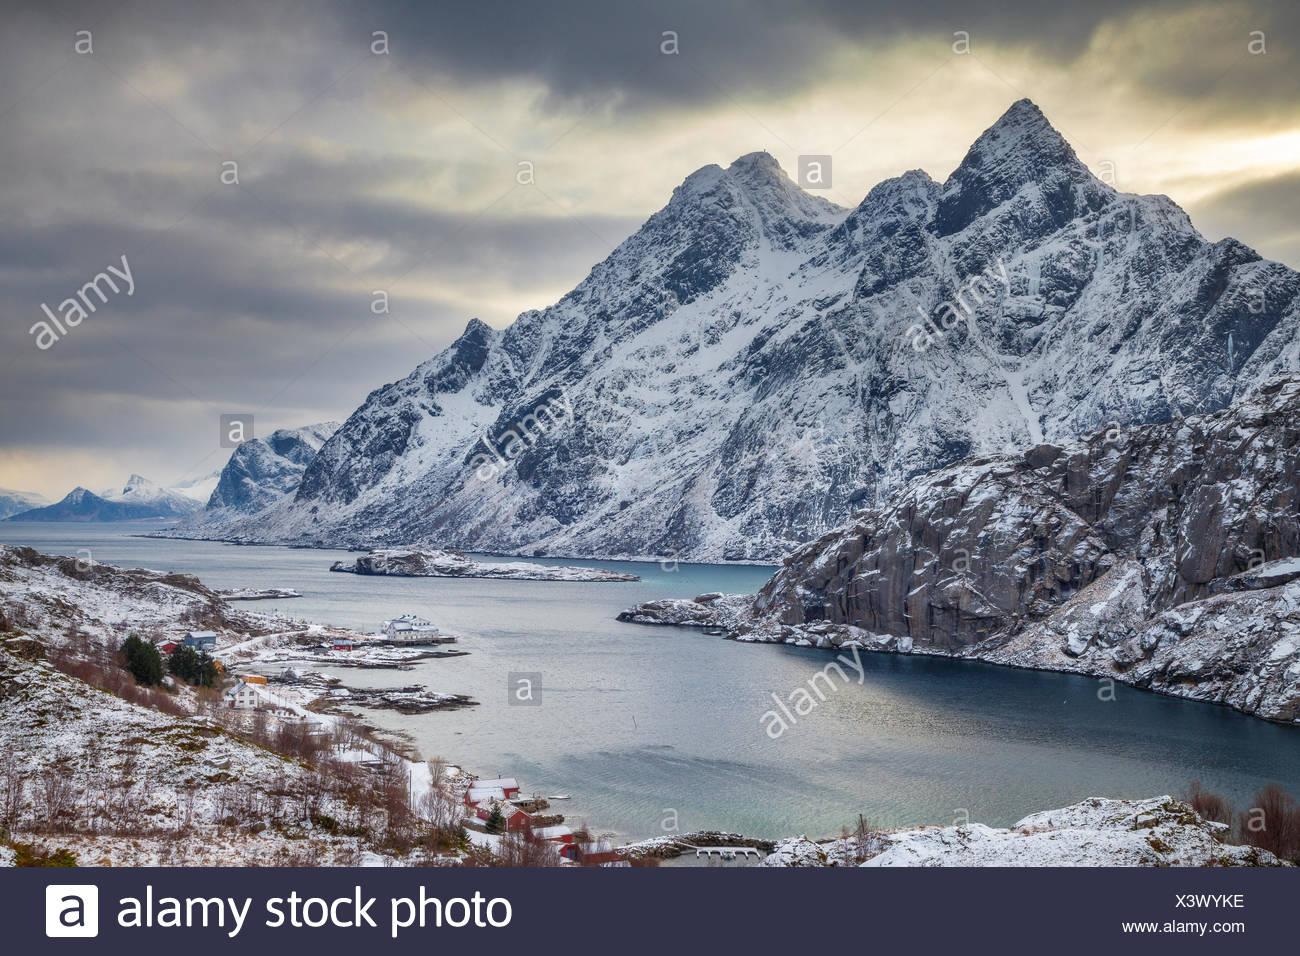 Norway, Lofoten, Storm over fjord in Vestvagoy - Stock Image